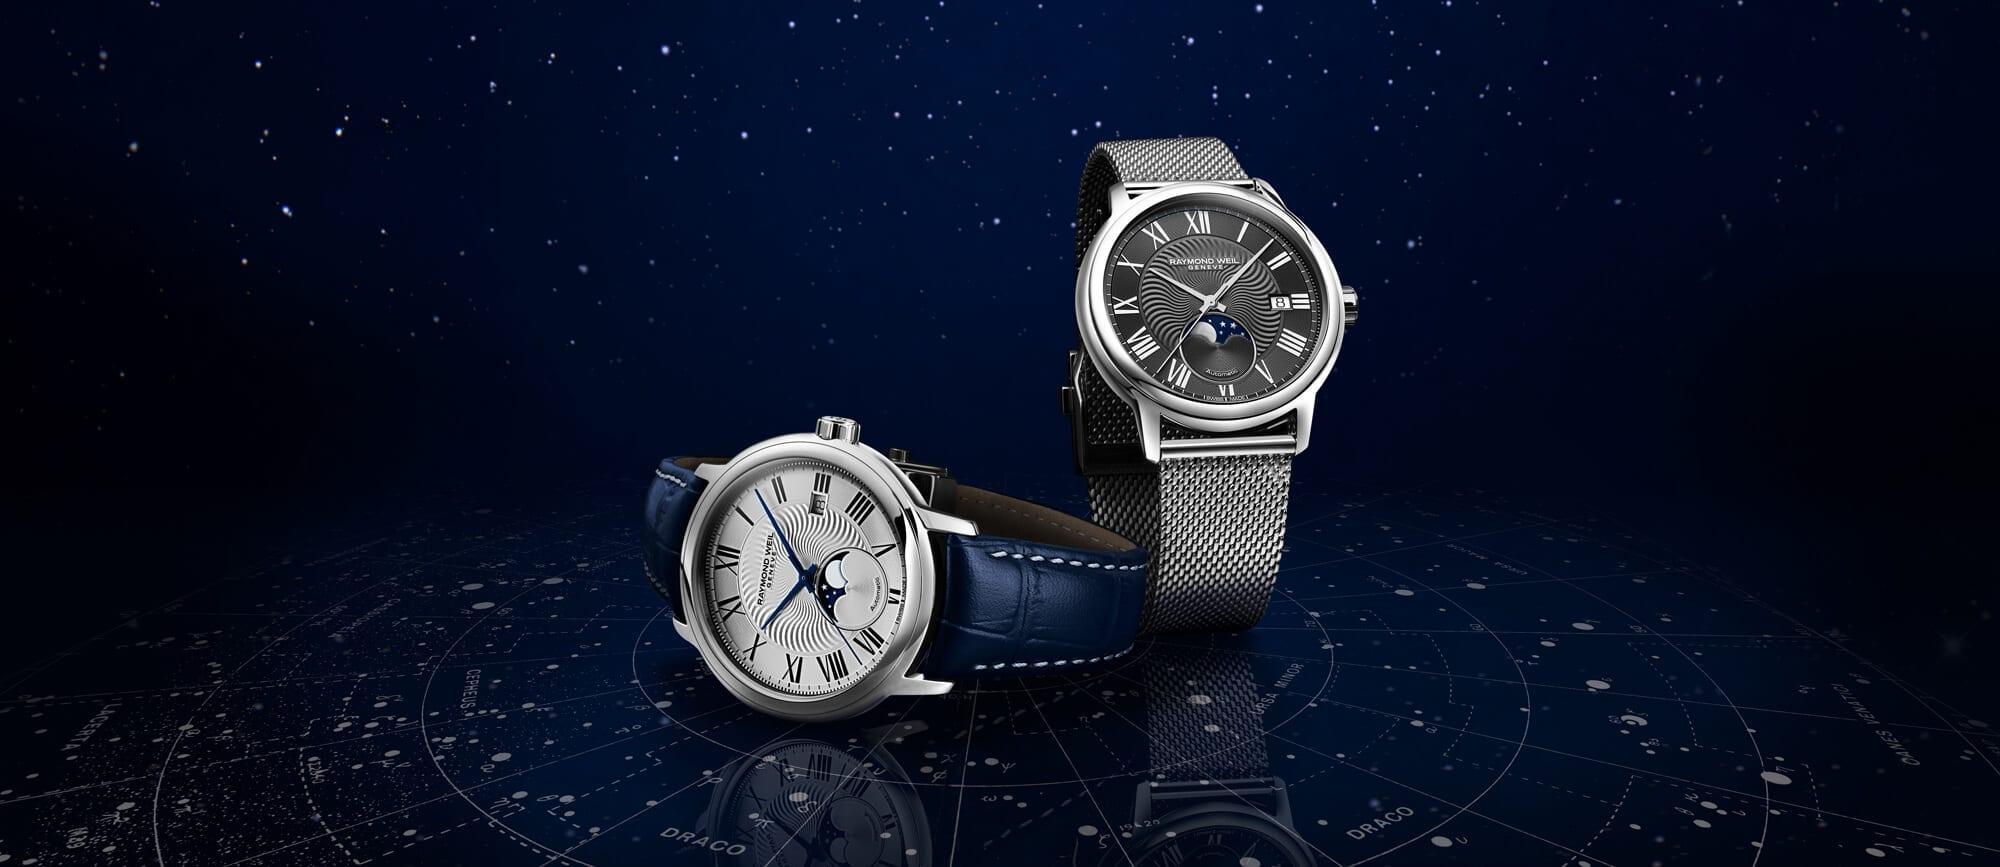 Maestro Moon Phase 2239 Grey Dial Men's Watch RAYMOND WEIL